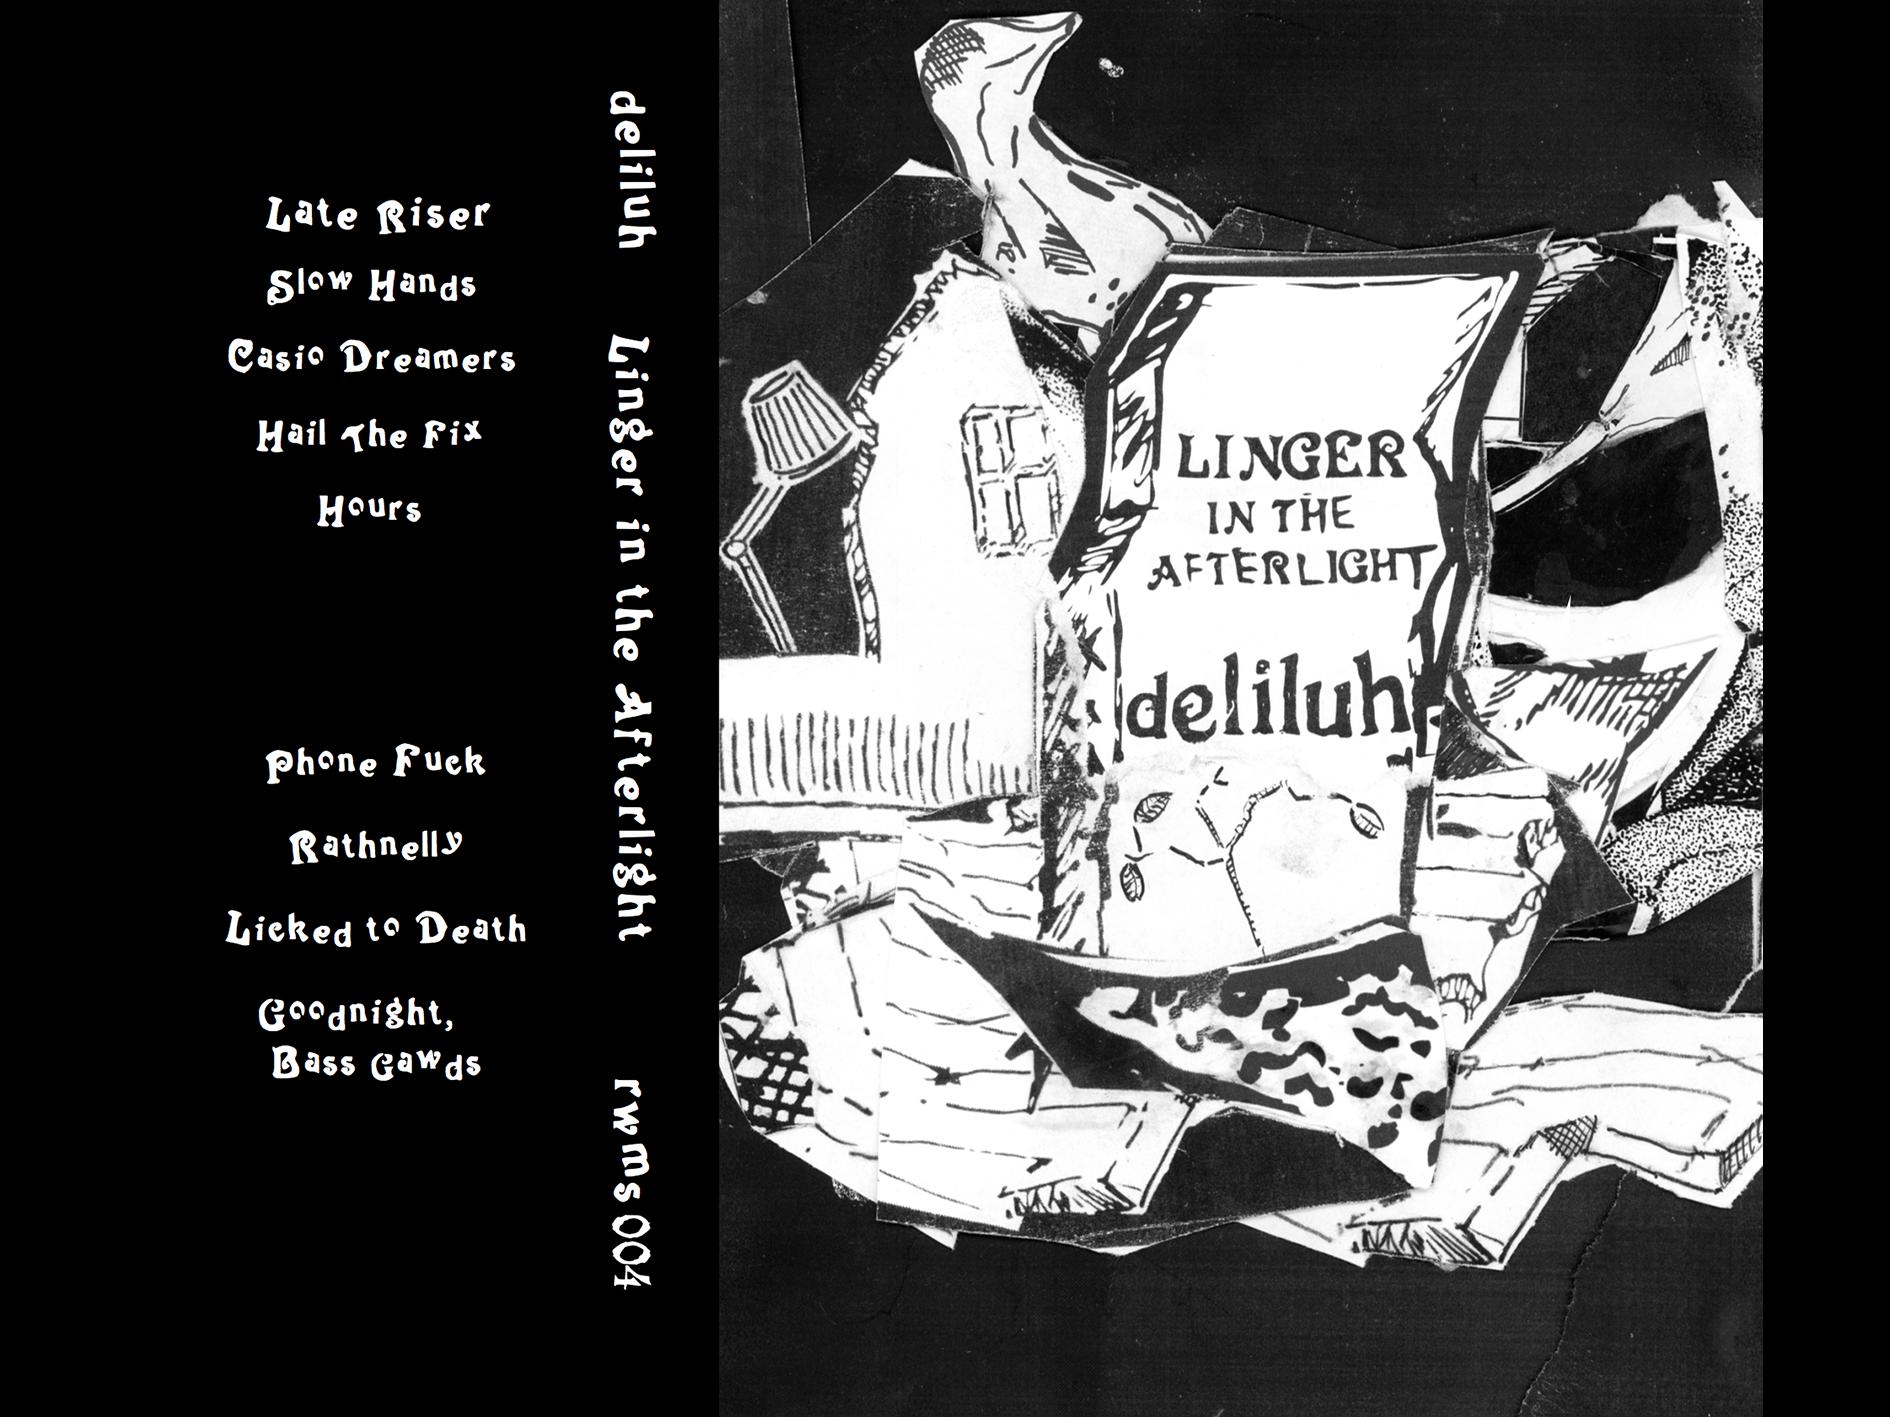 ALBUM ART BY BENJAMIN EDELBERG